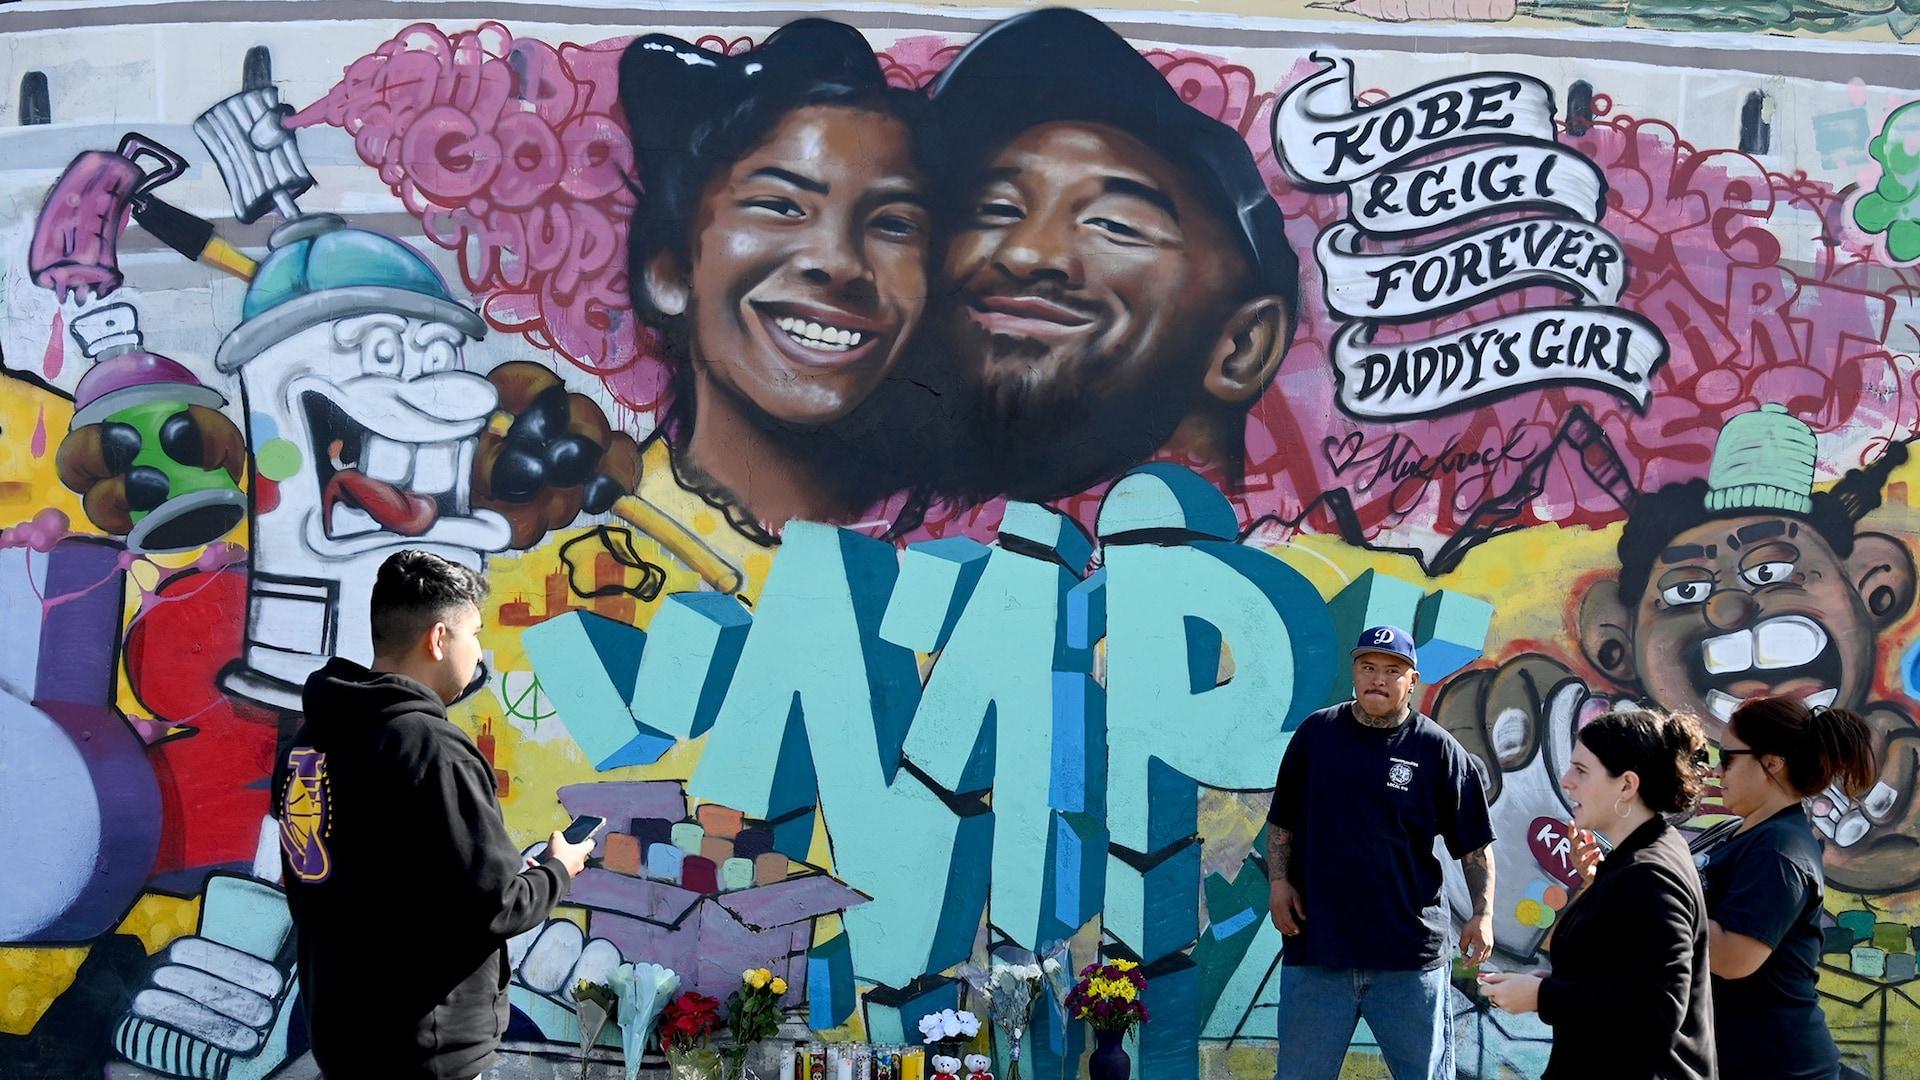 Kobe Bryant's relentless determination resonated throughout Los Angeles